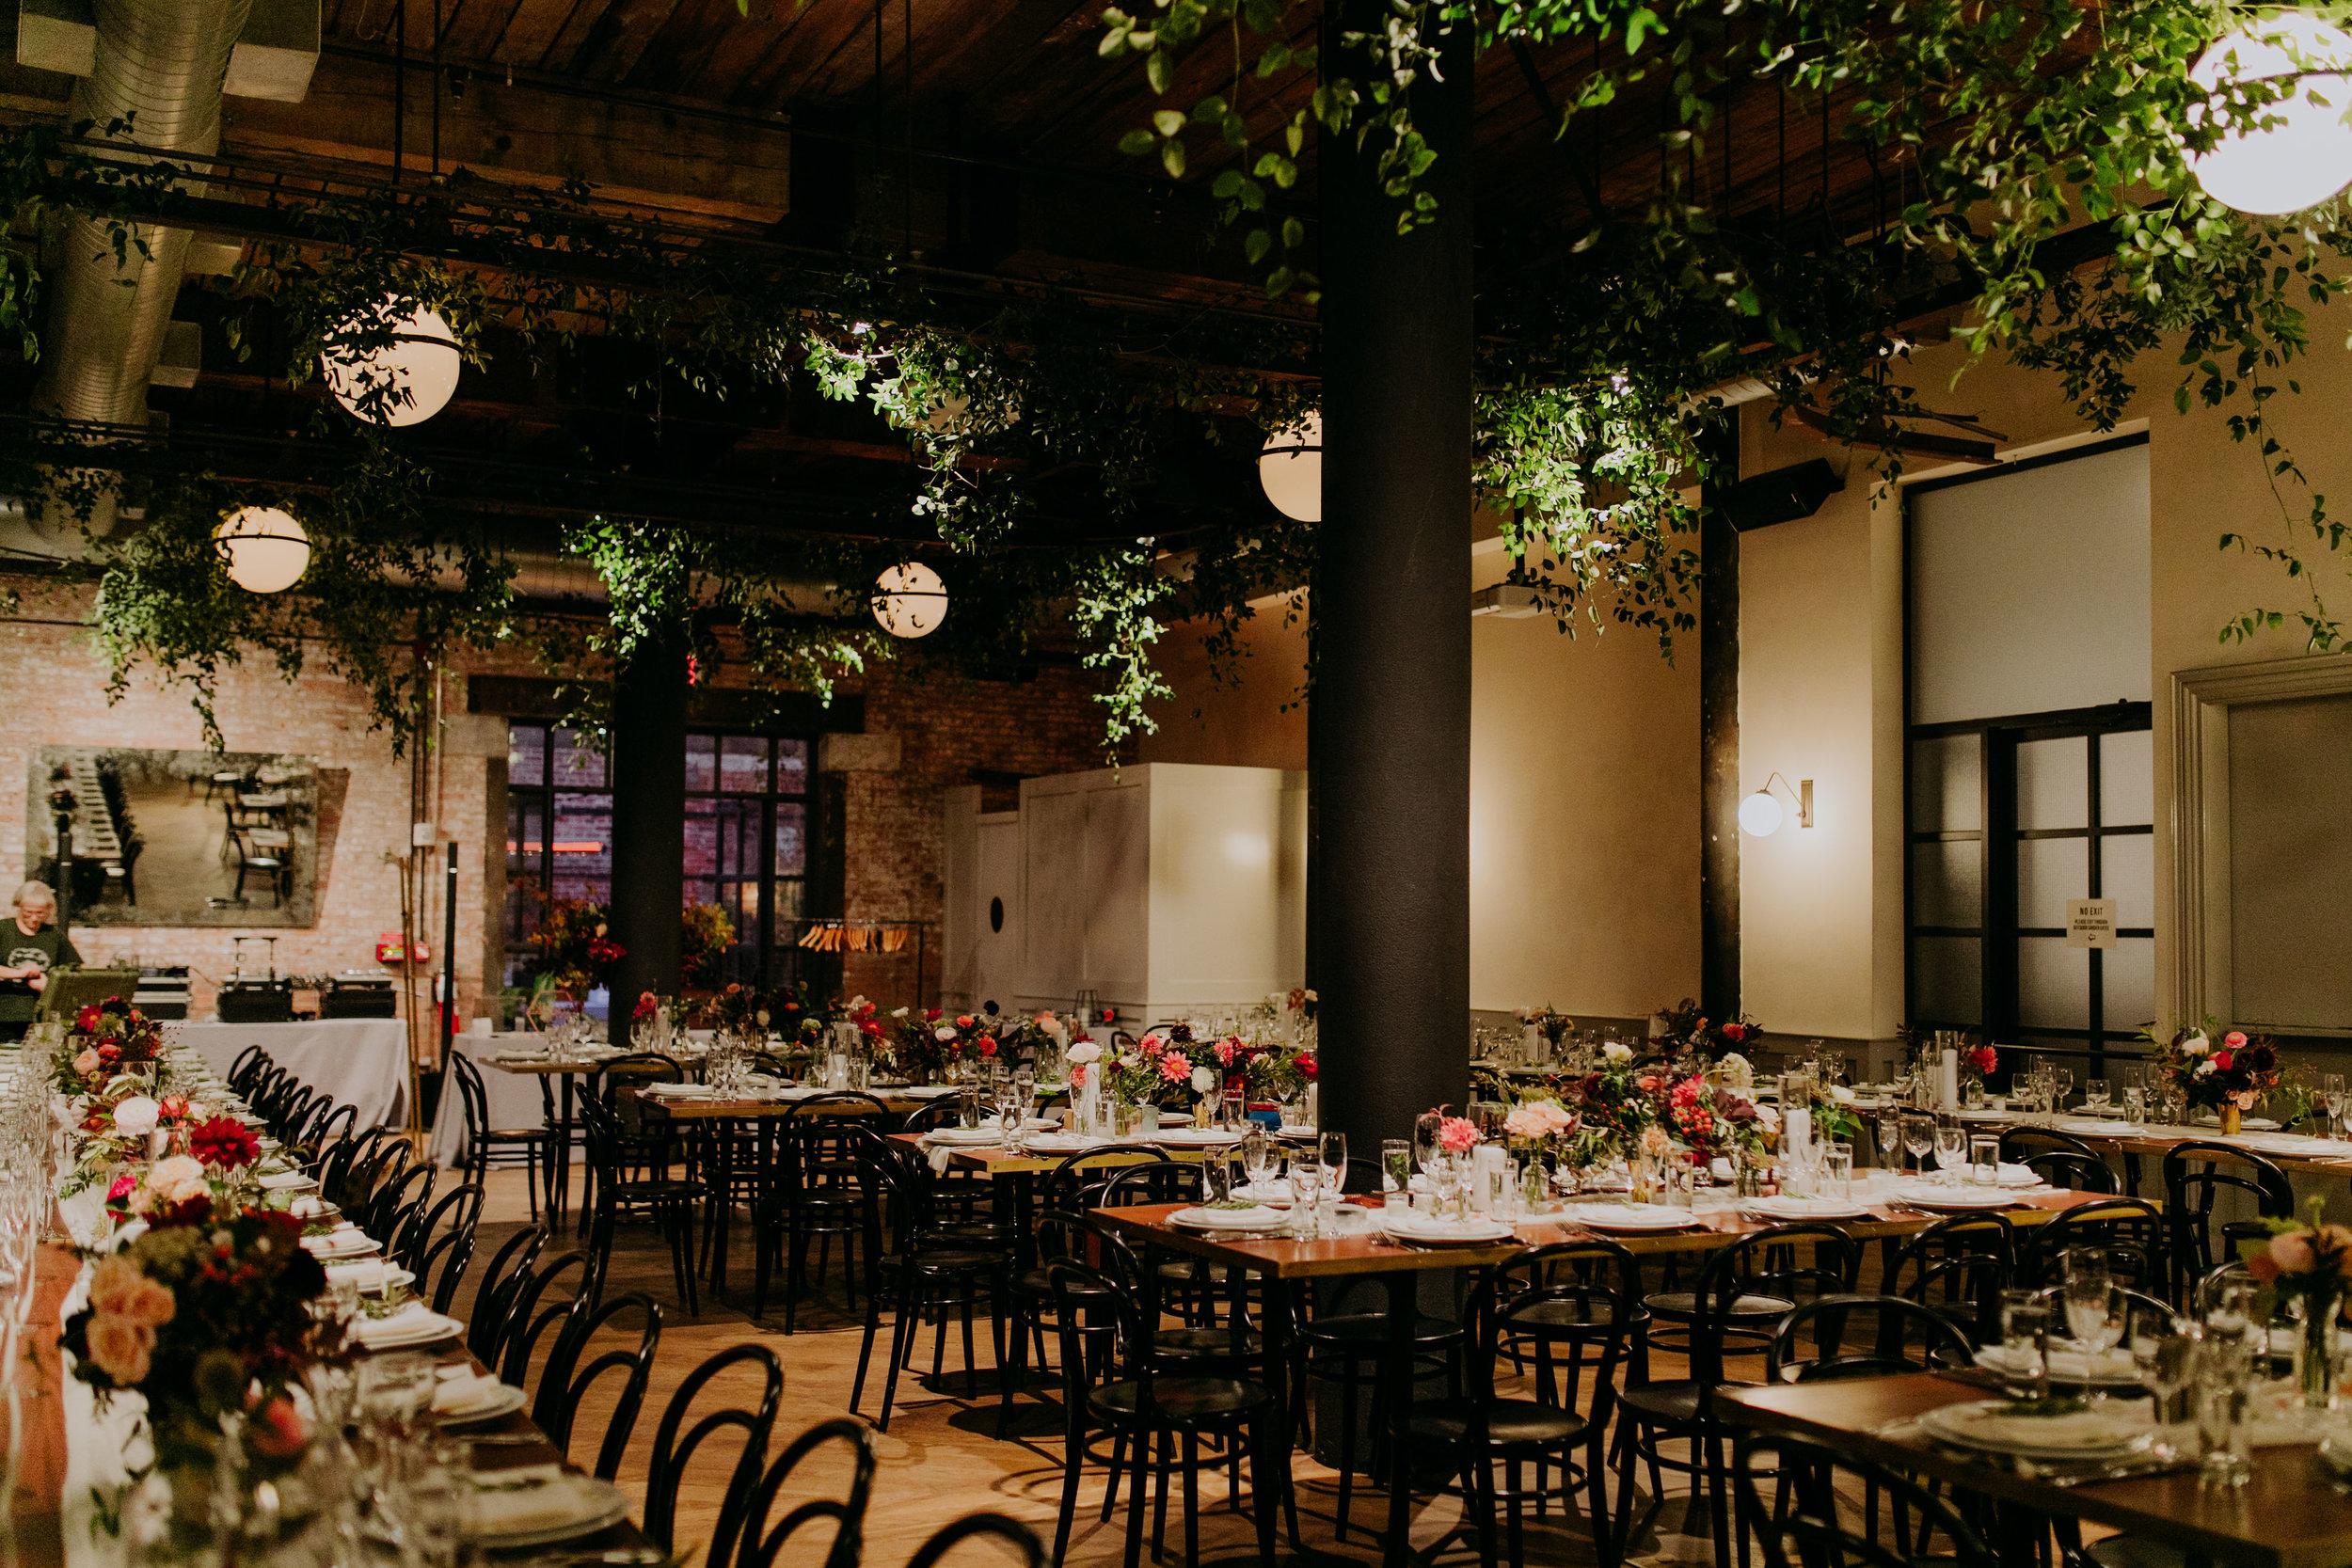 wythe-hotel-wedding-photographer-amber-gress-0431.jpg